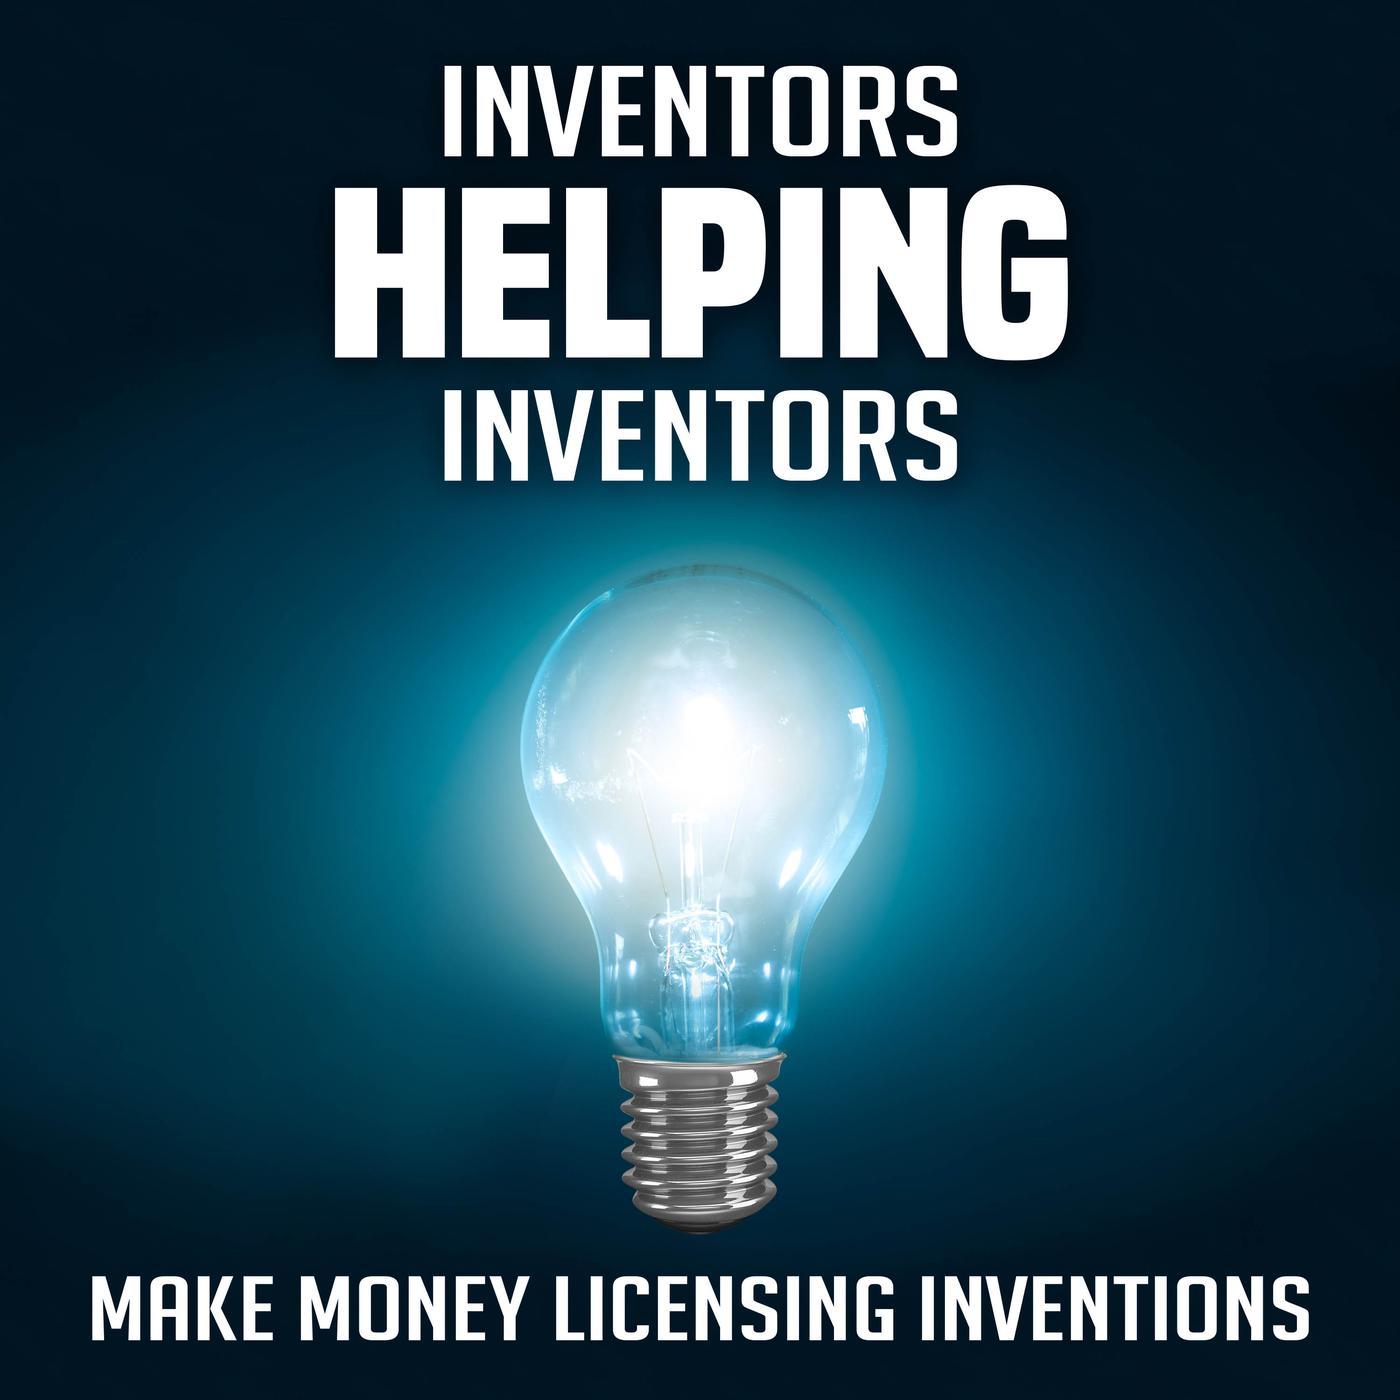 Inventors Helping Inventors